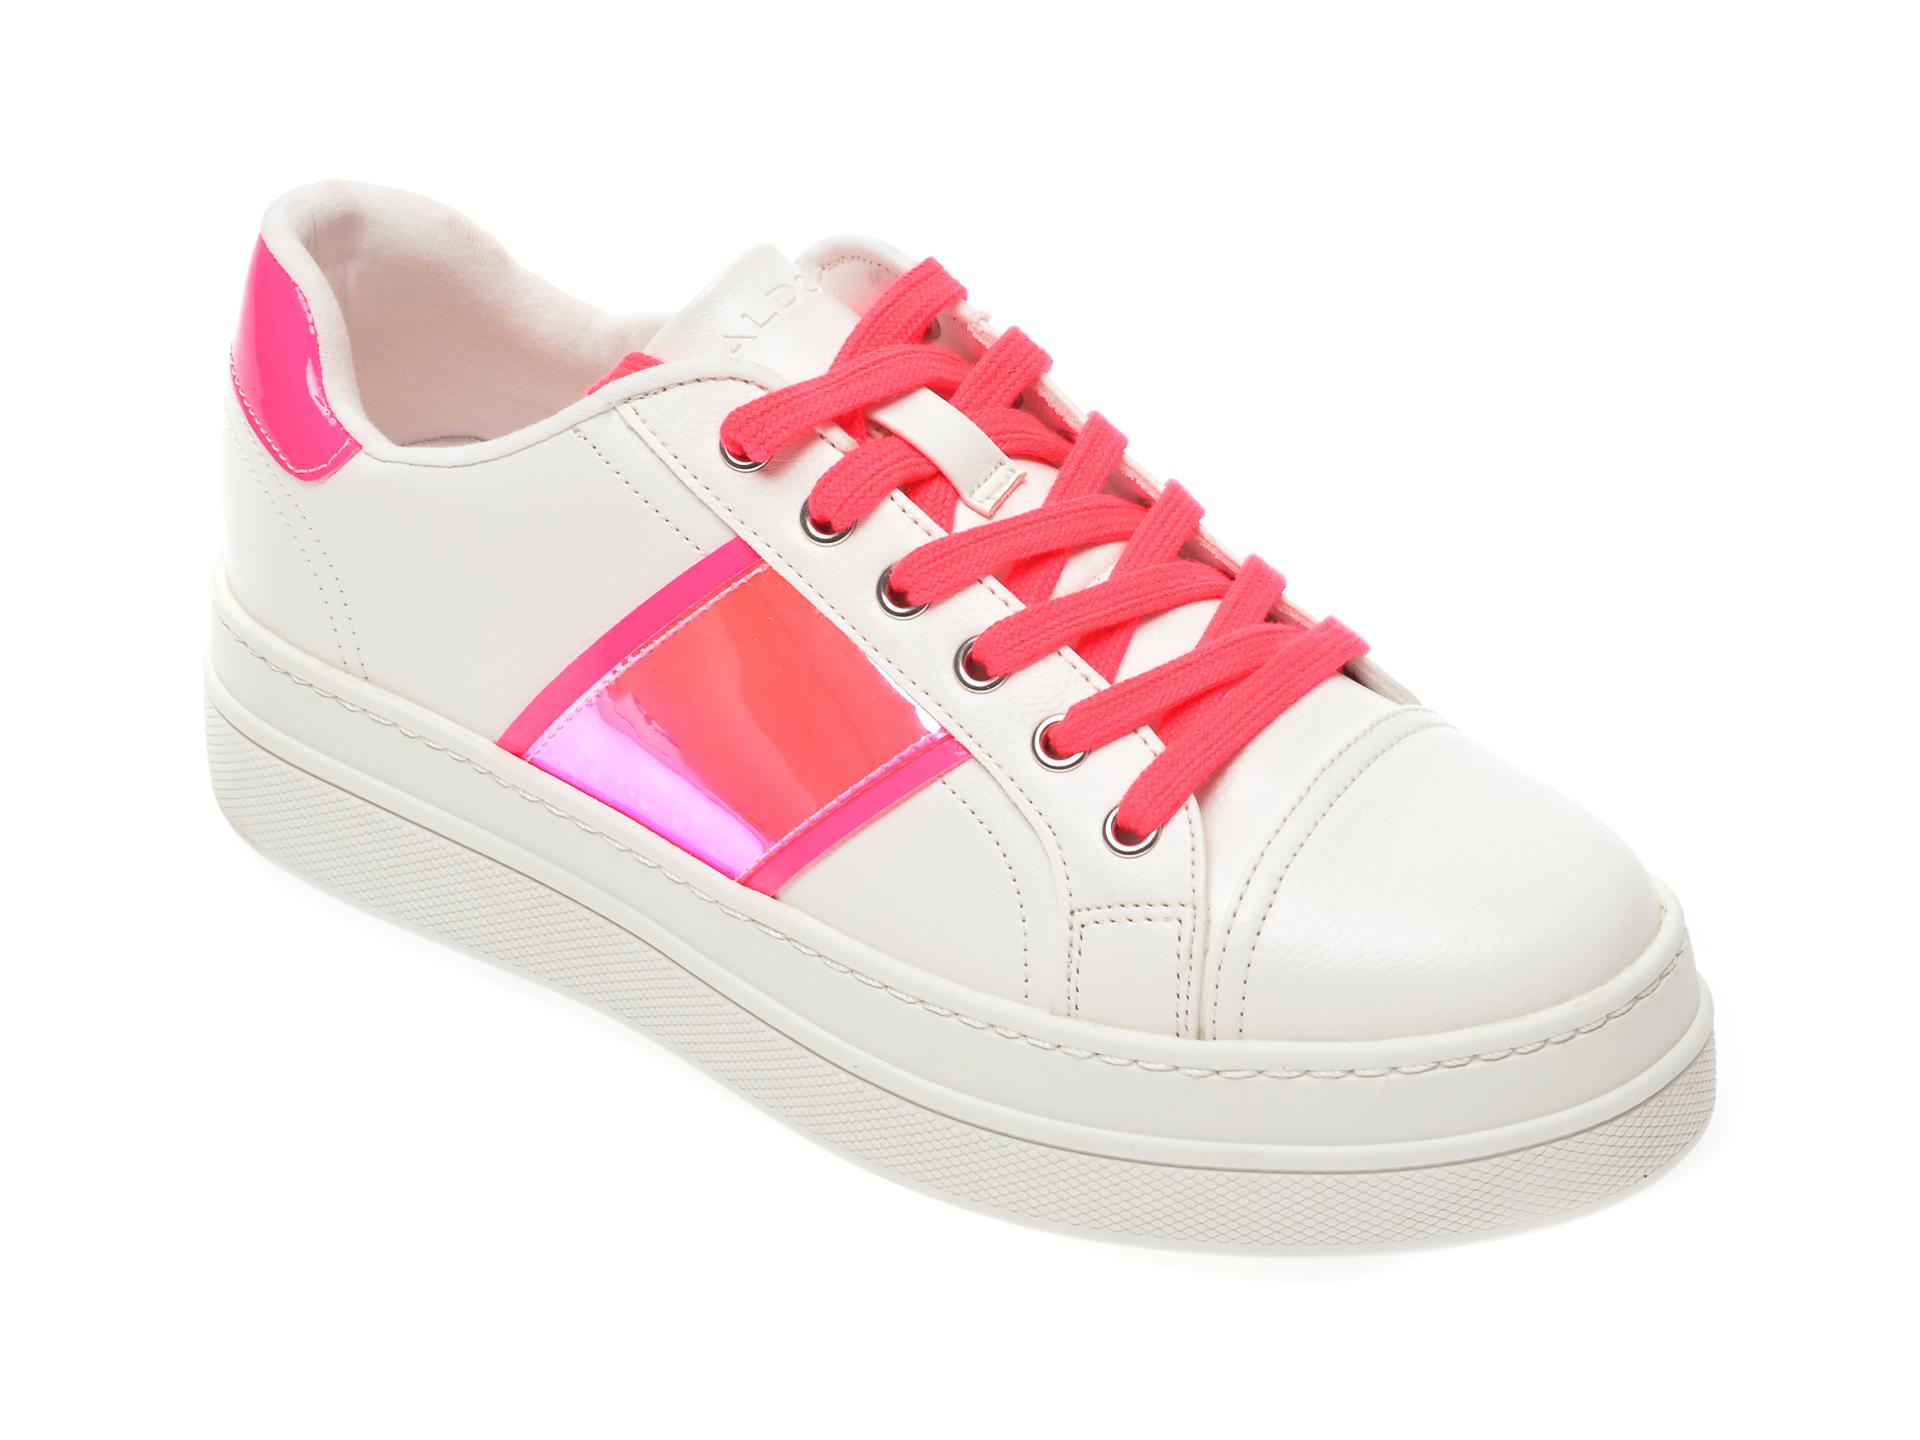 Pantofi sport ALDO albi Starburst670, din piele ecologica New